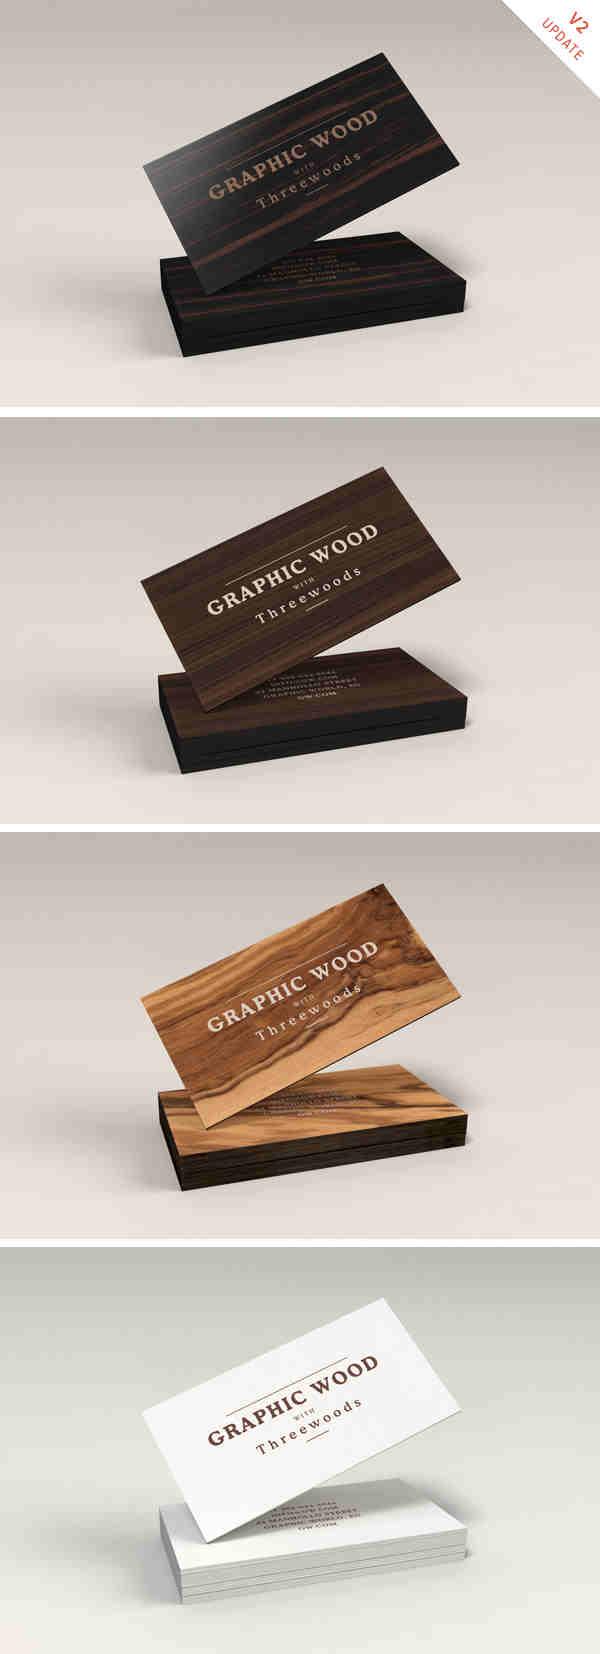 Natural Wooden Business Cards Mockup